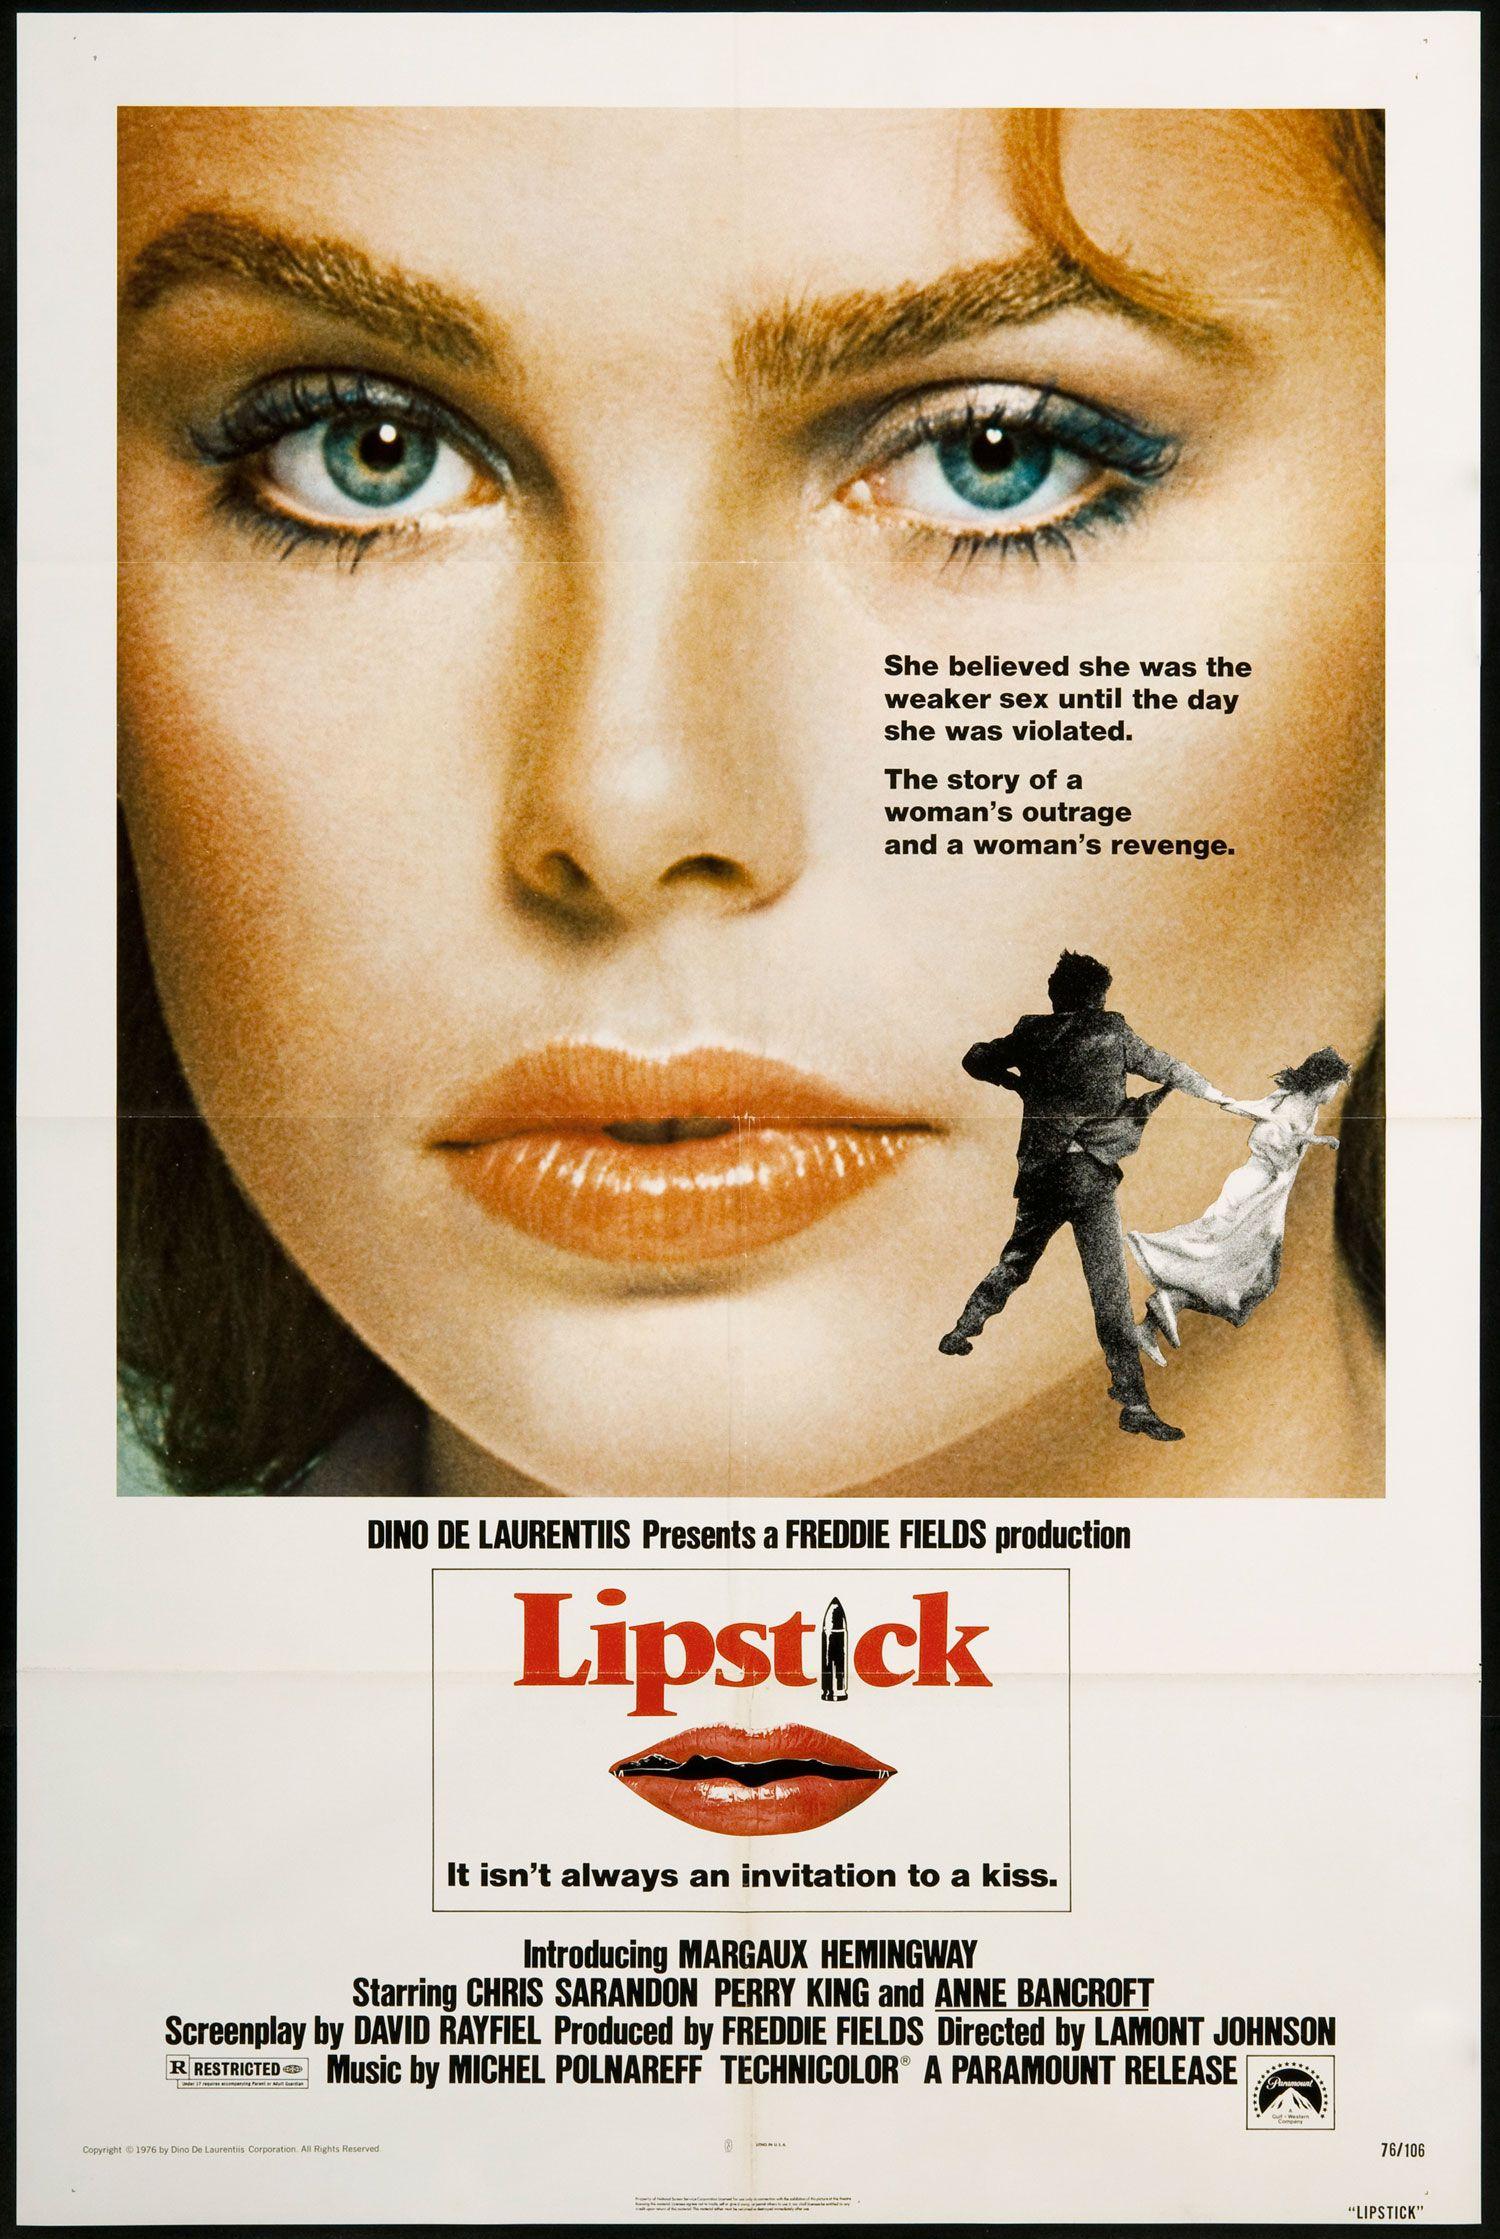 LIPSTICK (1976)   Margaux hemingway, Carteles de películas